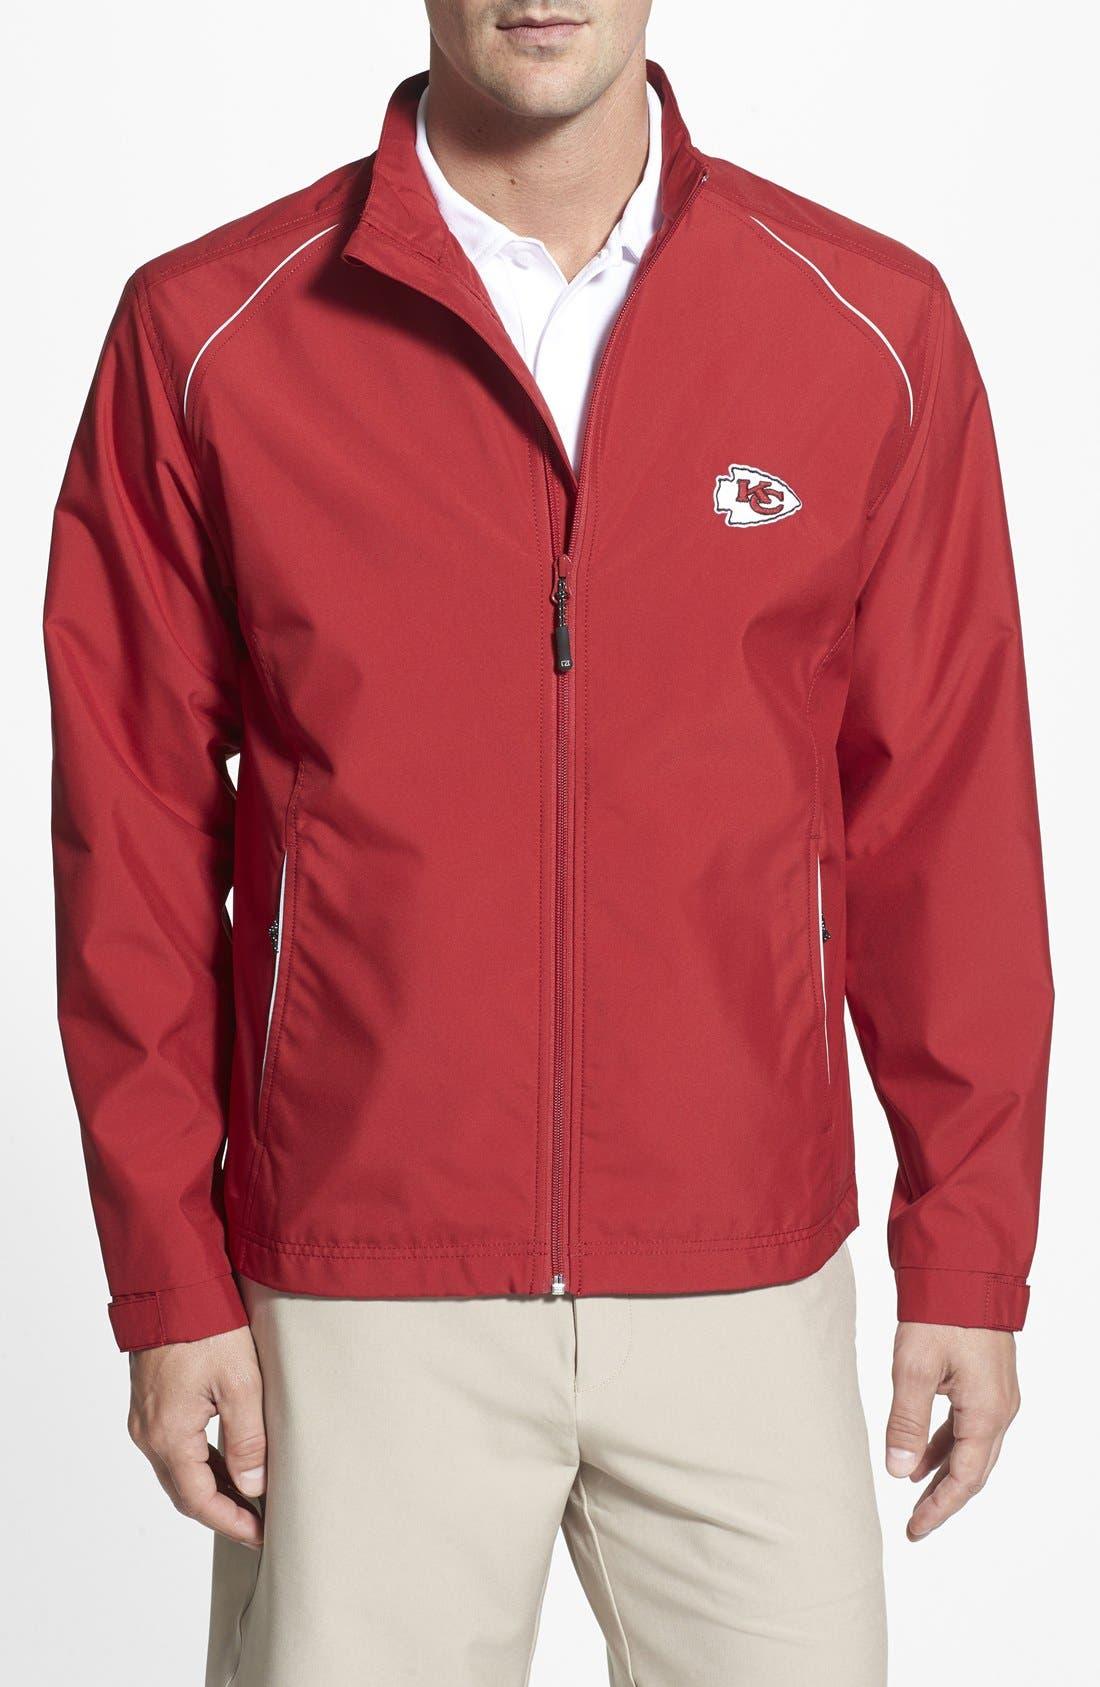 Alternate Image 1 Selected - Cutter & Buck Kansas City Chiefs - Beacon WeatherTec Wind & Water Resistant Jacket